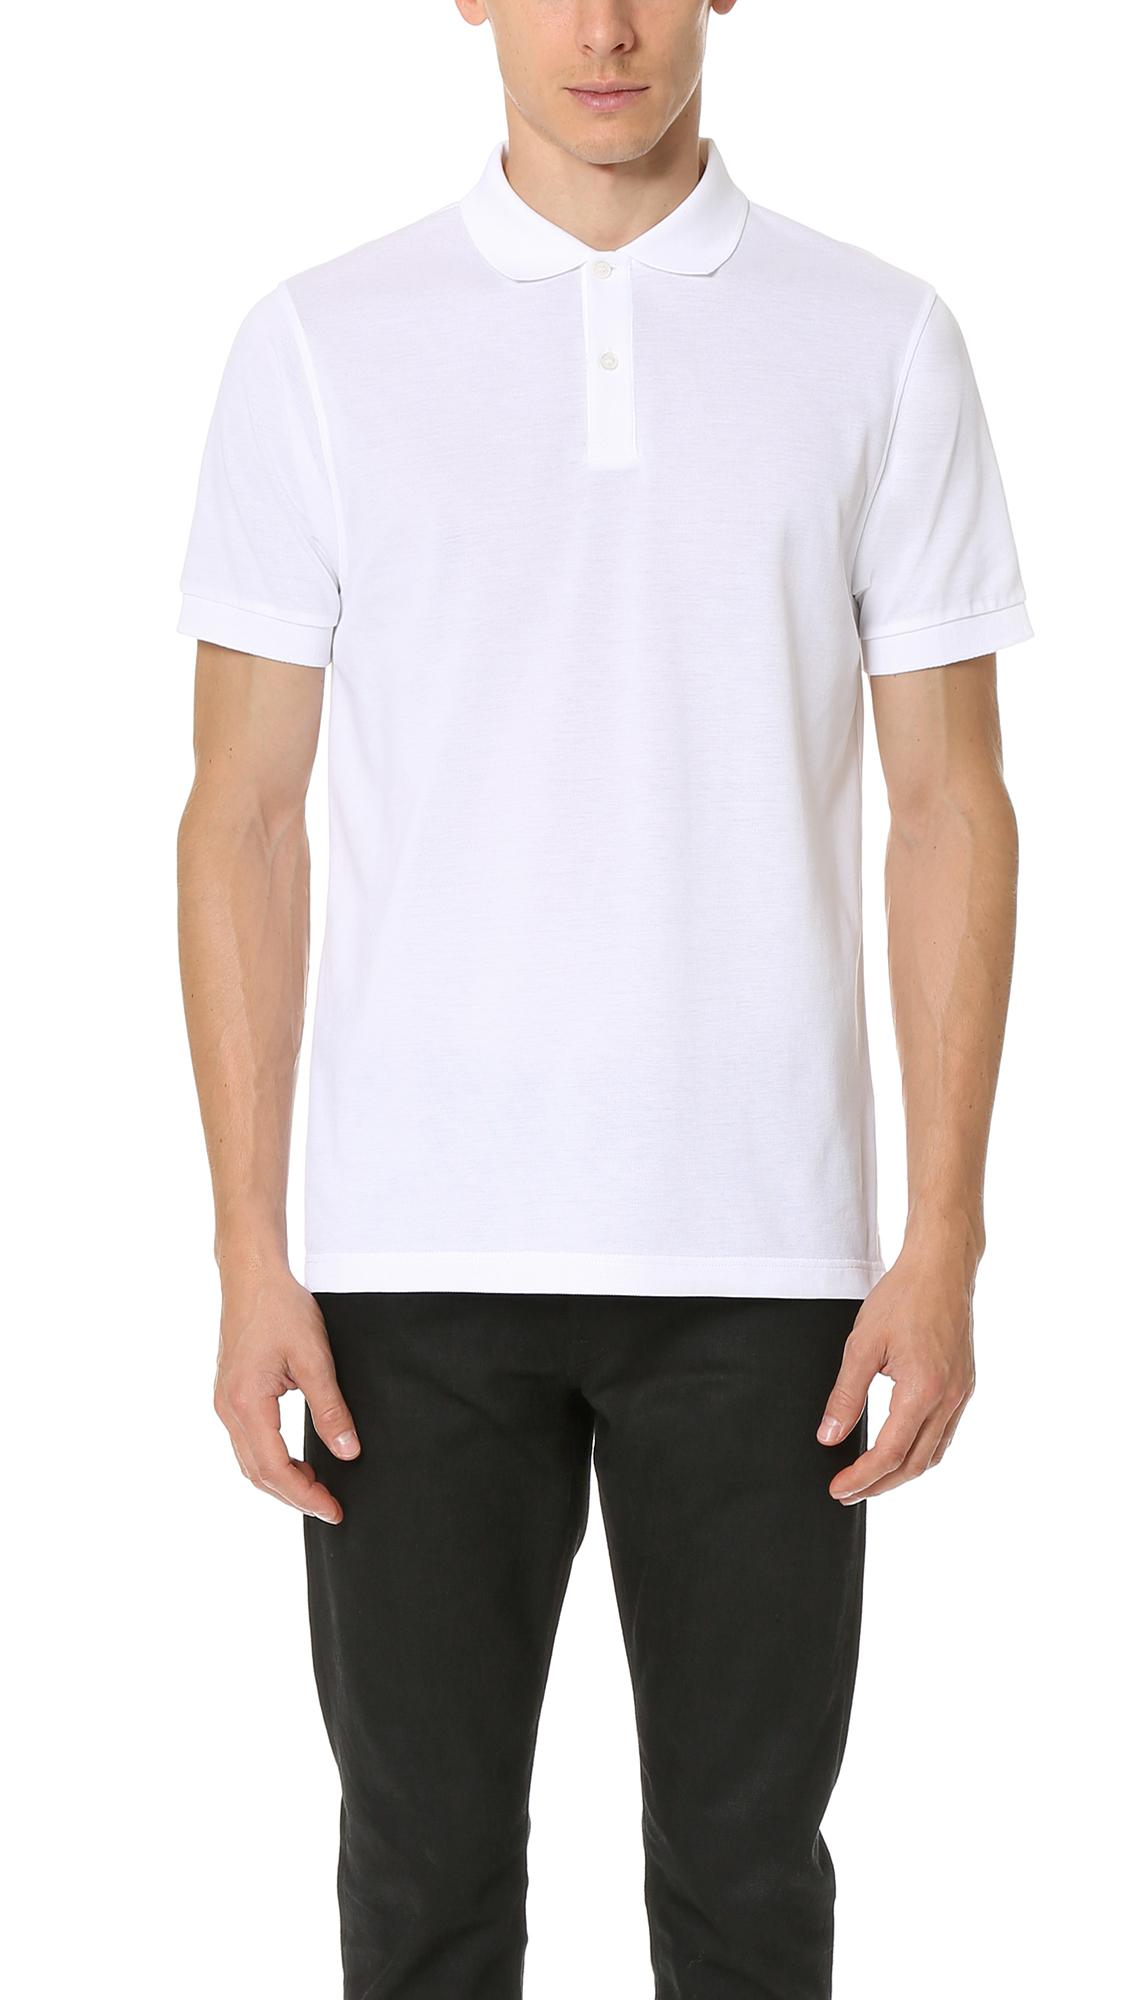 a5143fad Sunspel Short Sleeve Pique Polo Shirt In White | ModeSens